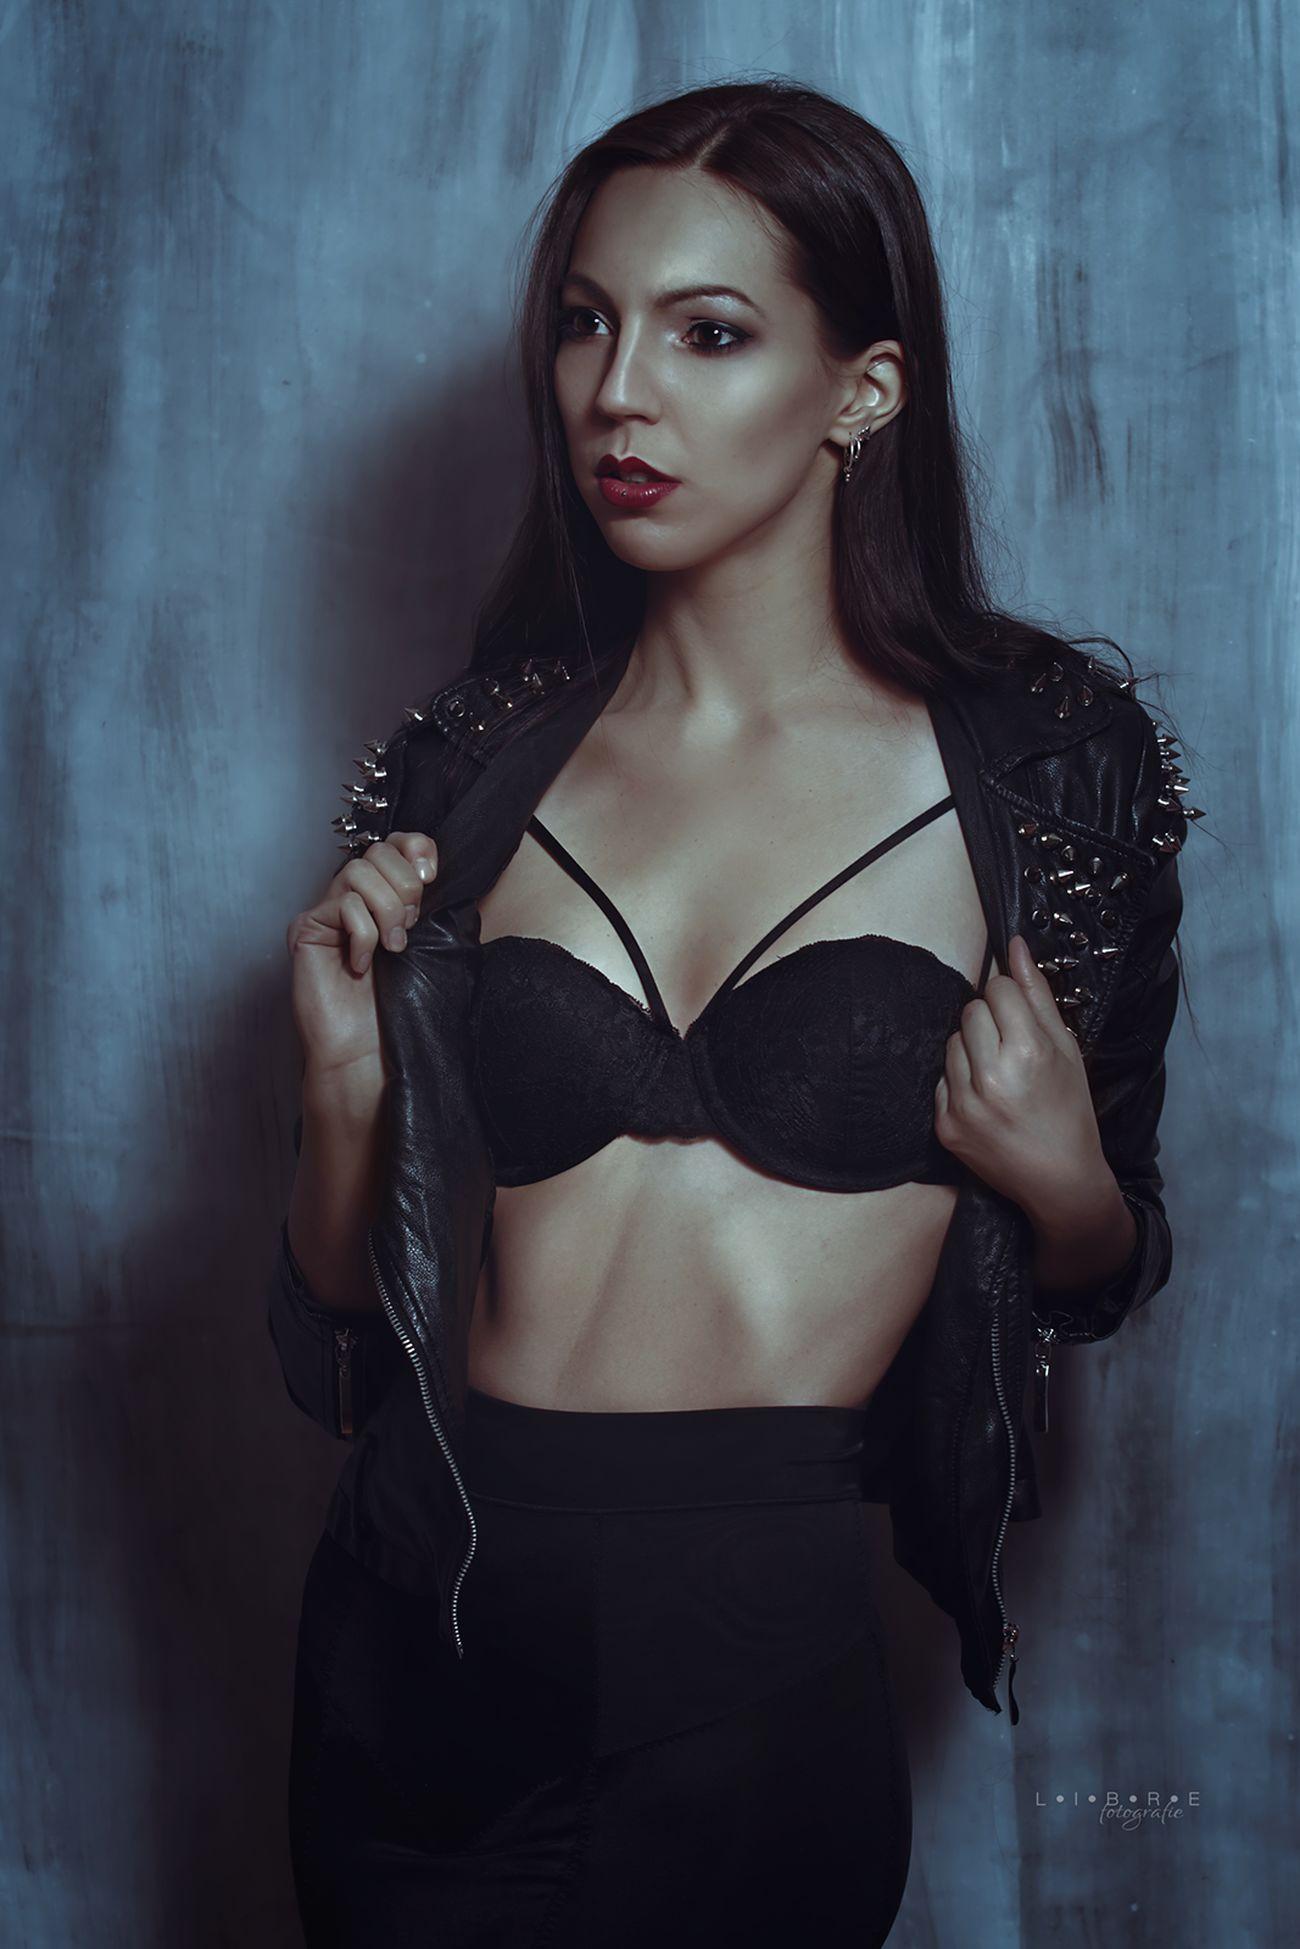 Anna Lena l Hotgirl Redlips Photoshoot Blackhair Fashion Harness Librefotografie BlackDress Bonn Cologne